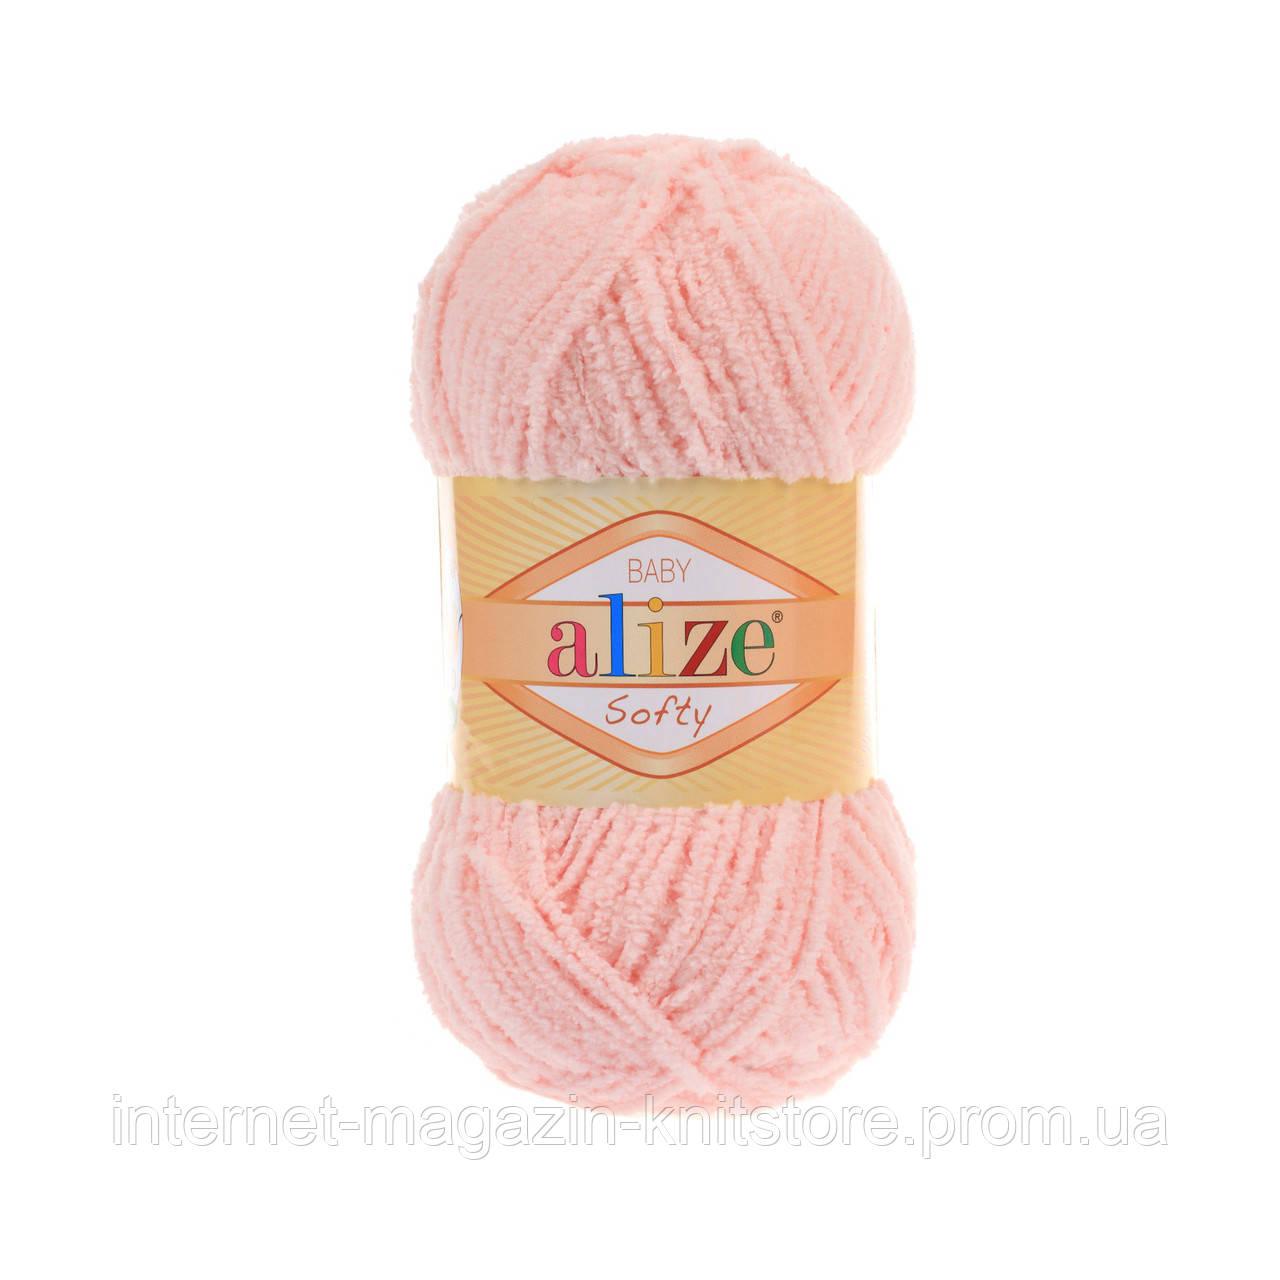 Пряжа Alize Softy Розовый